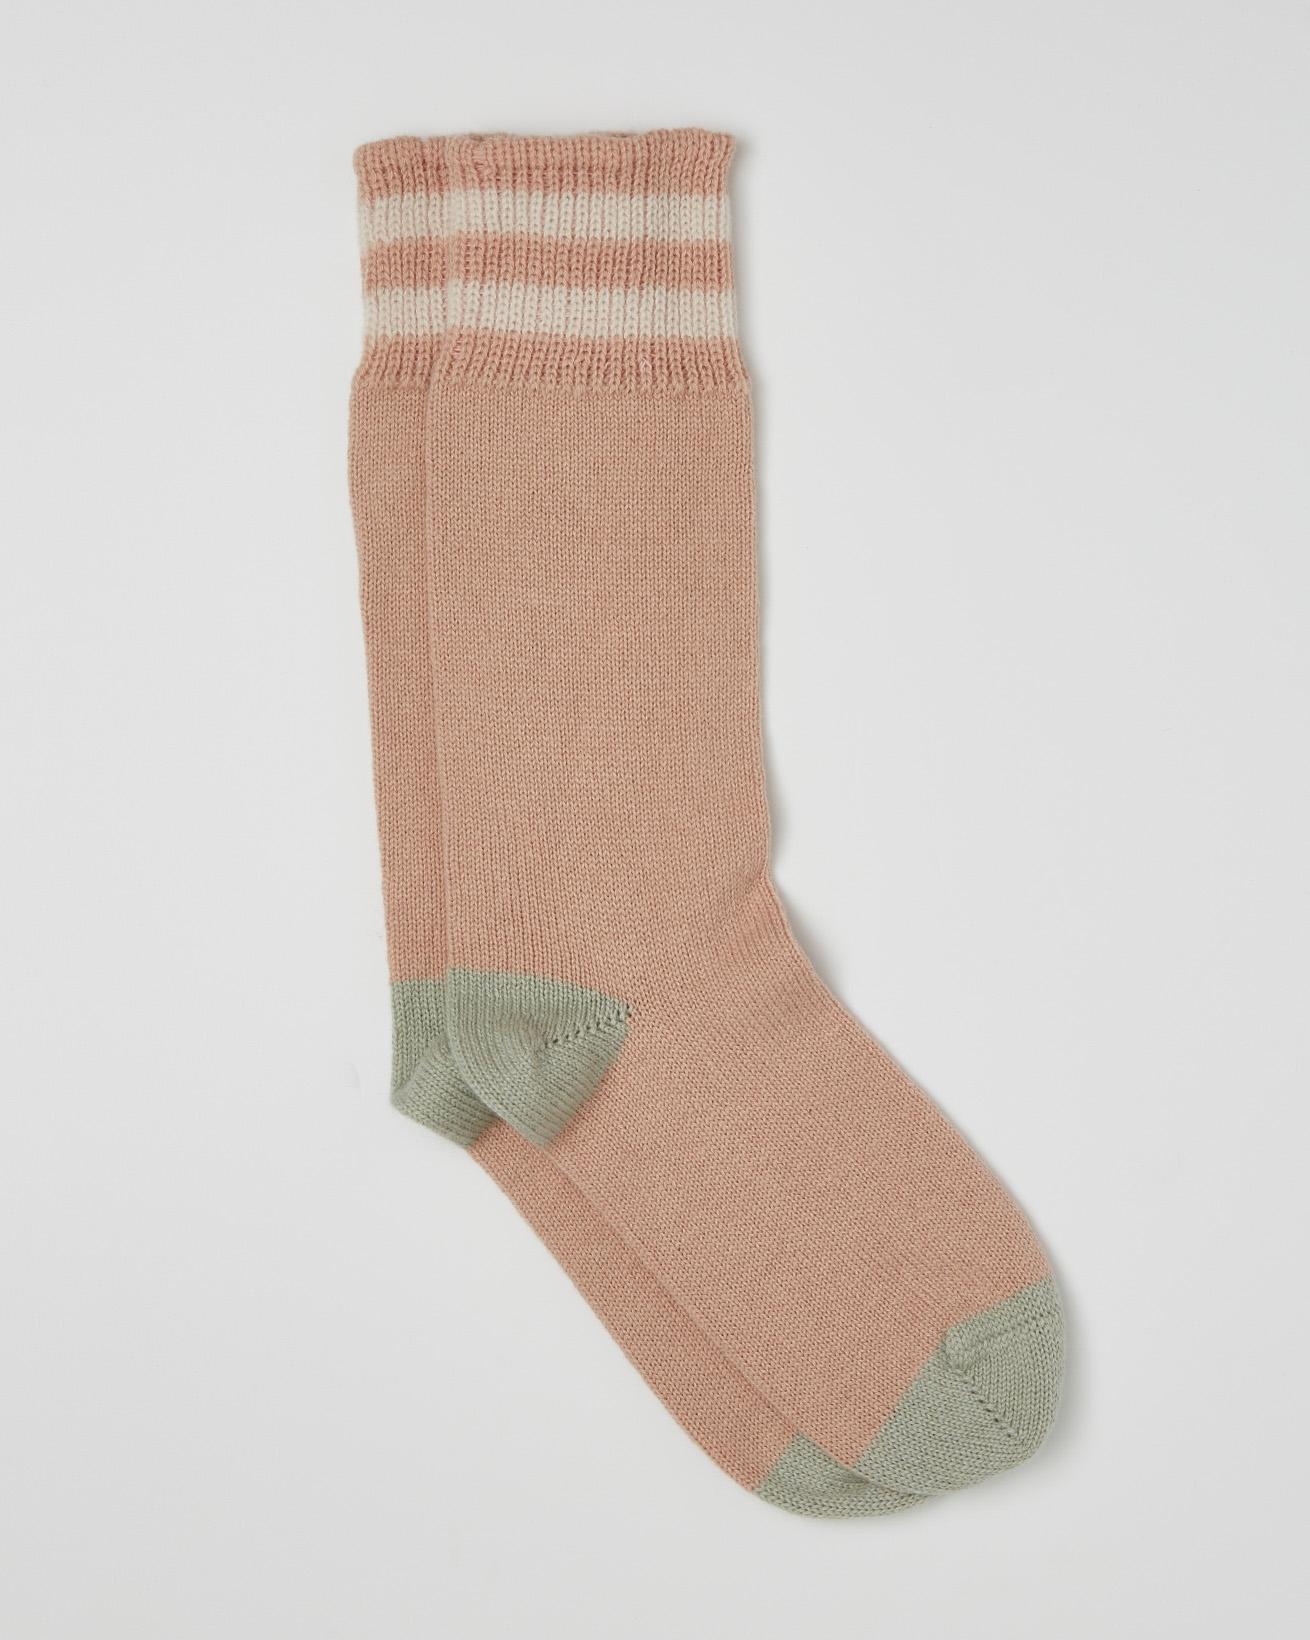 Ladies Cashmere Cotton Socks - Size Medium - Peony, Sage - 2461